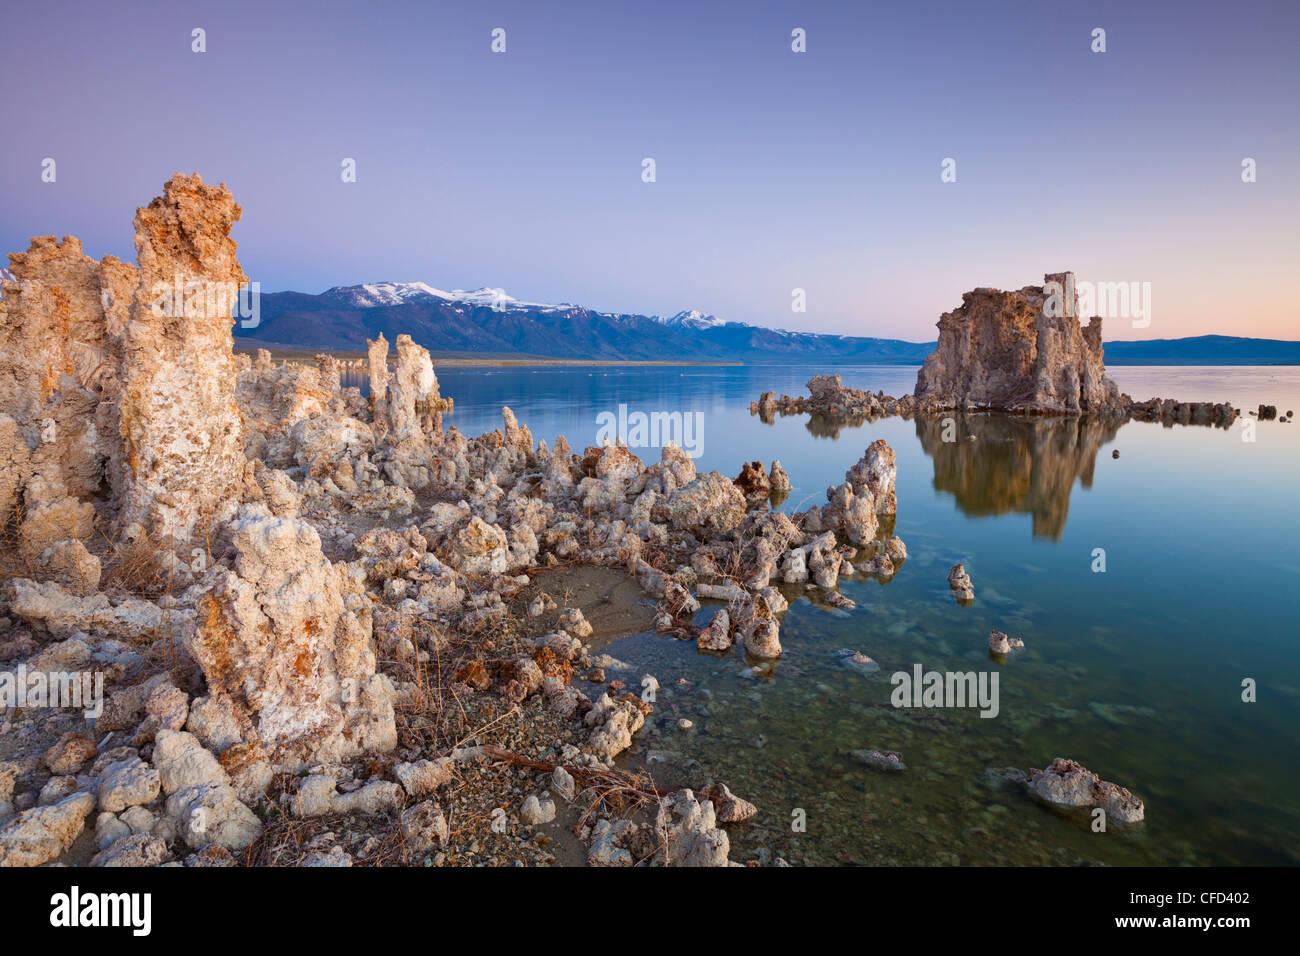 Flèches et de tuf formations tour de carbonate de calcium, Inyo National Forest Scenic Area, California, USA Photo Stock